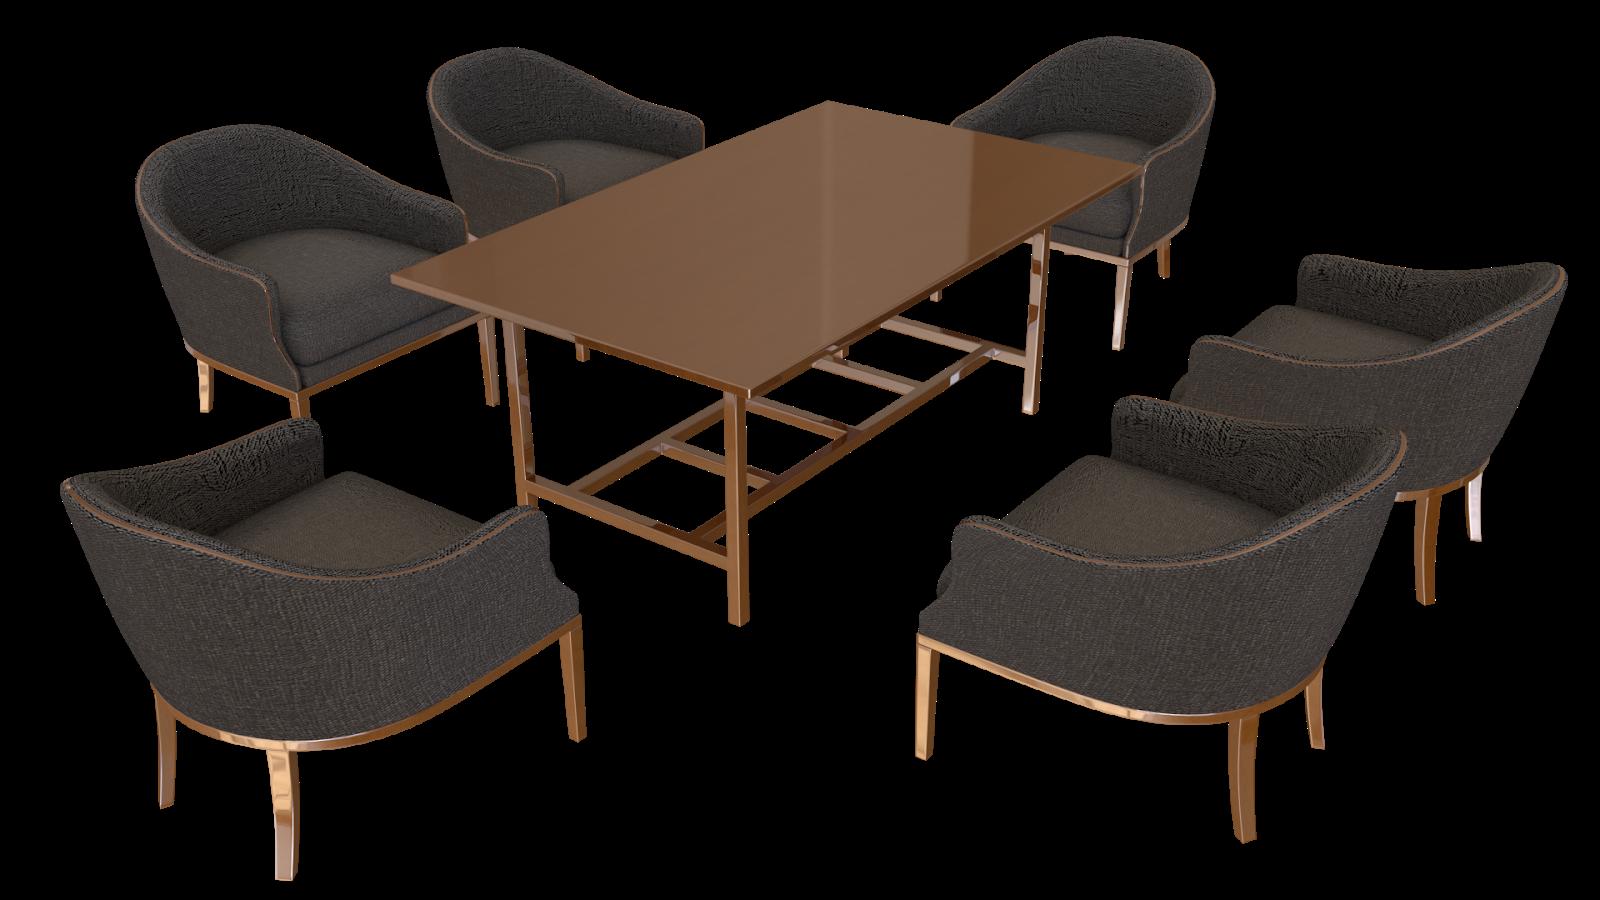 Free 3D Sofa Chairs & Table CC0 3DS - Free 3D Models Under Public Domain